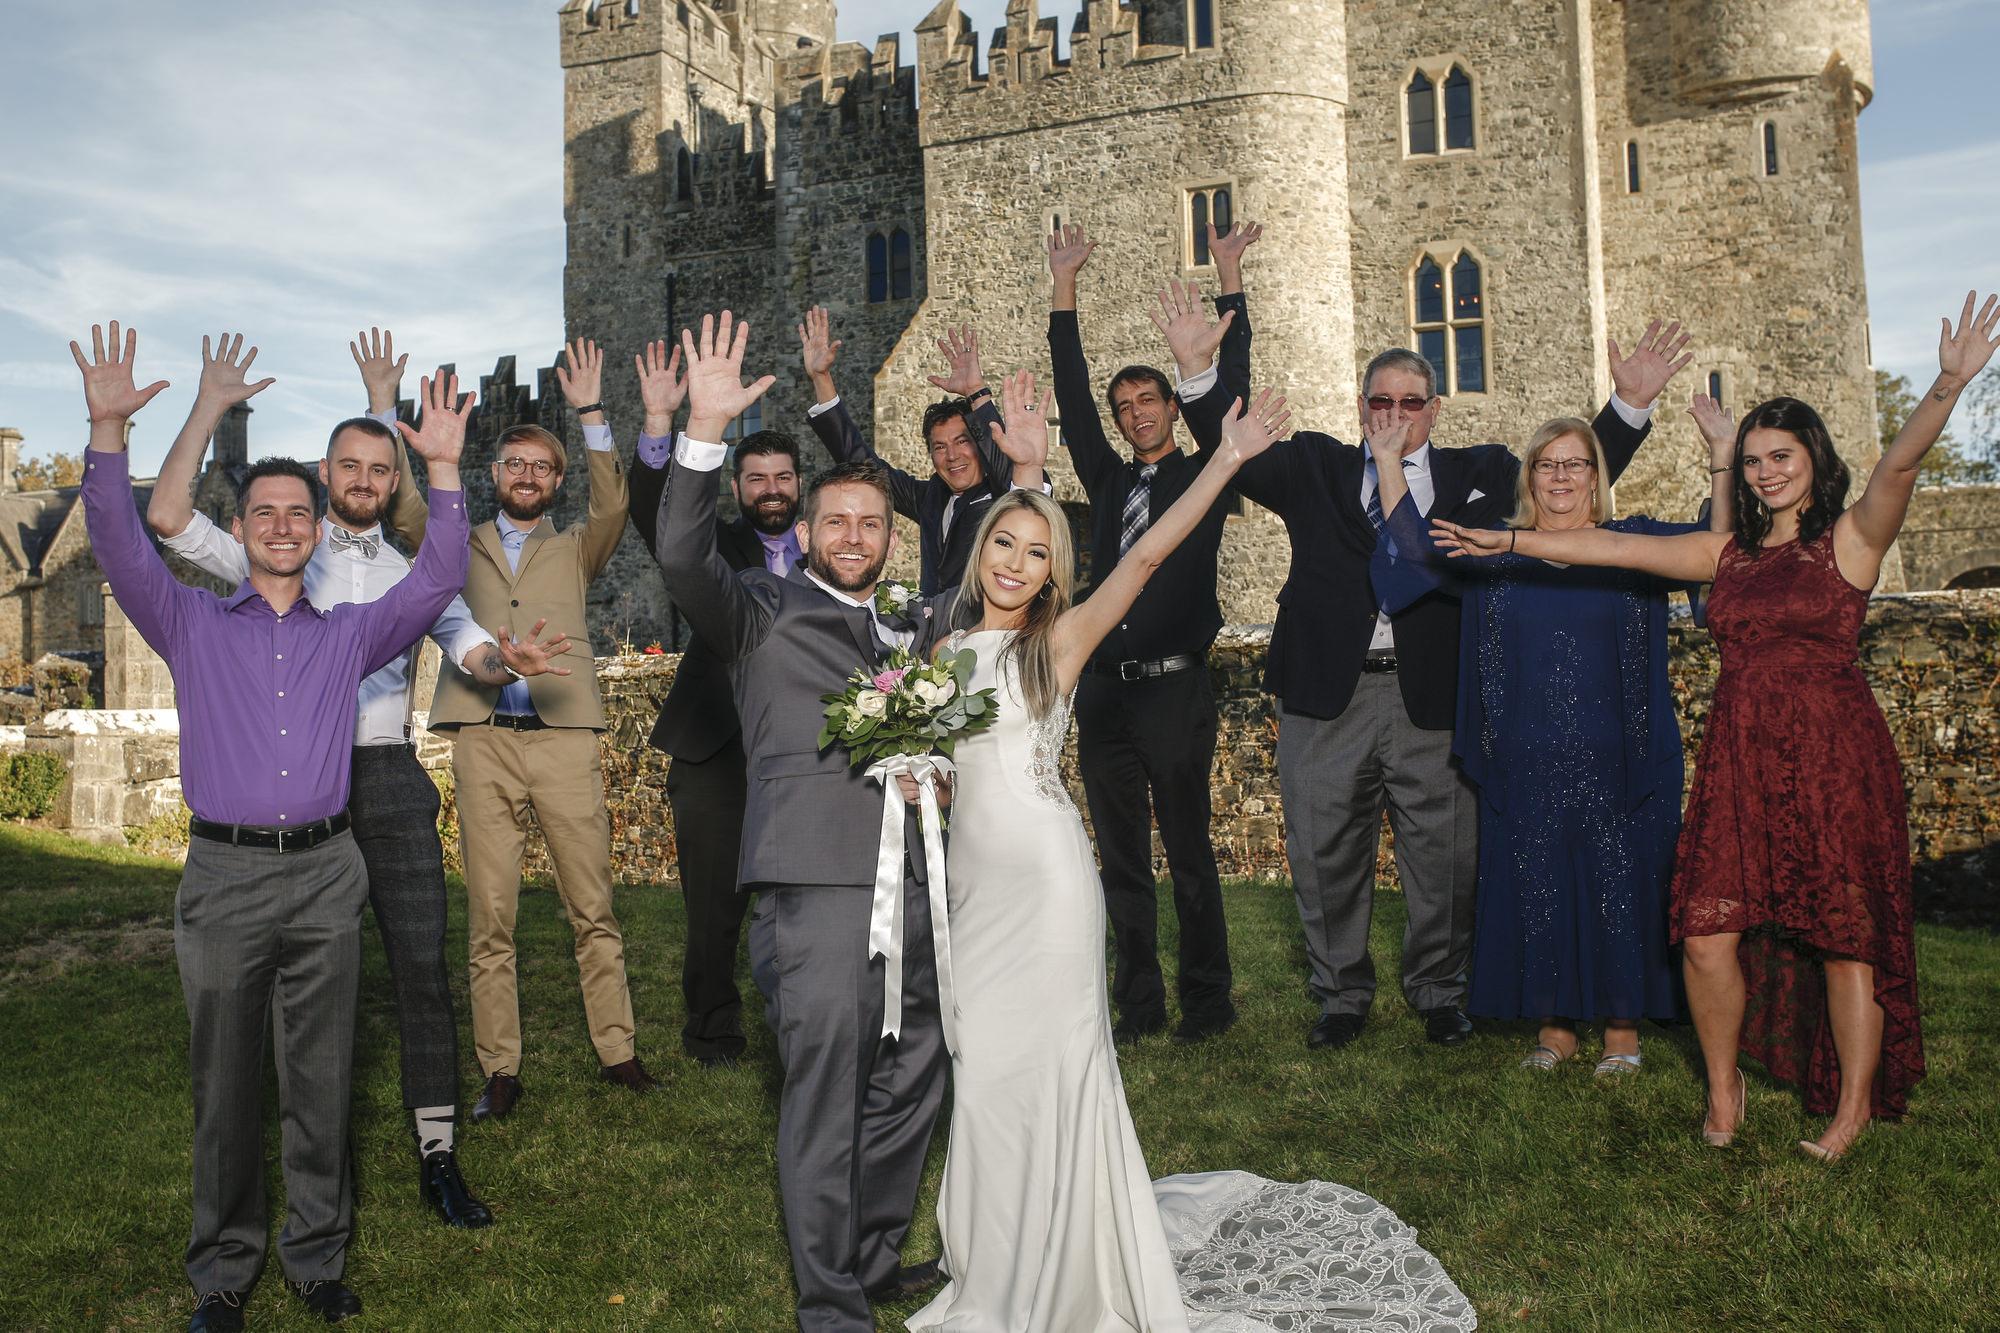 kilkea_castle_wedding_photographer_goldenmoments_040.jpg